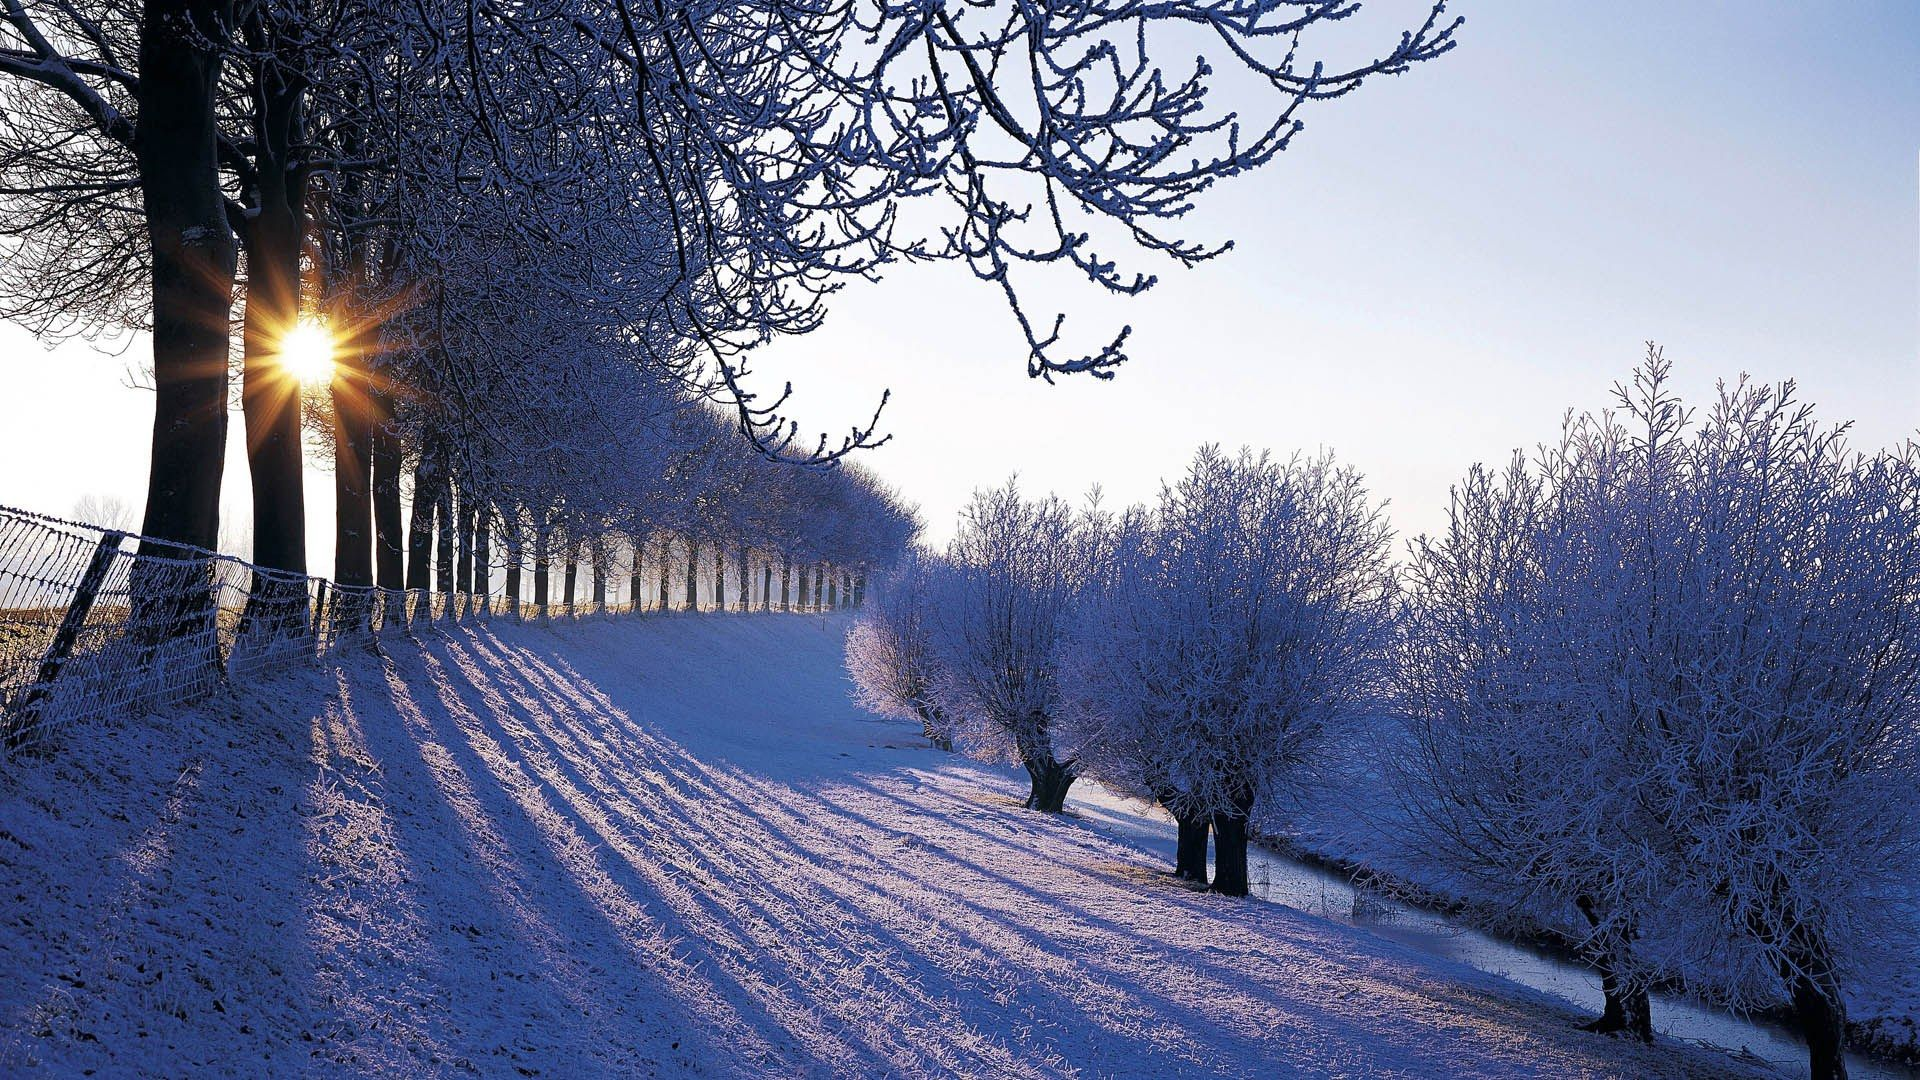 Winter Nature Google Search Winter Scenery Winter Landscape Winter Wallpaper